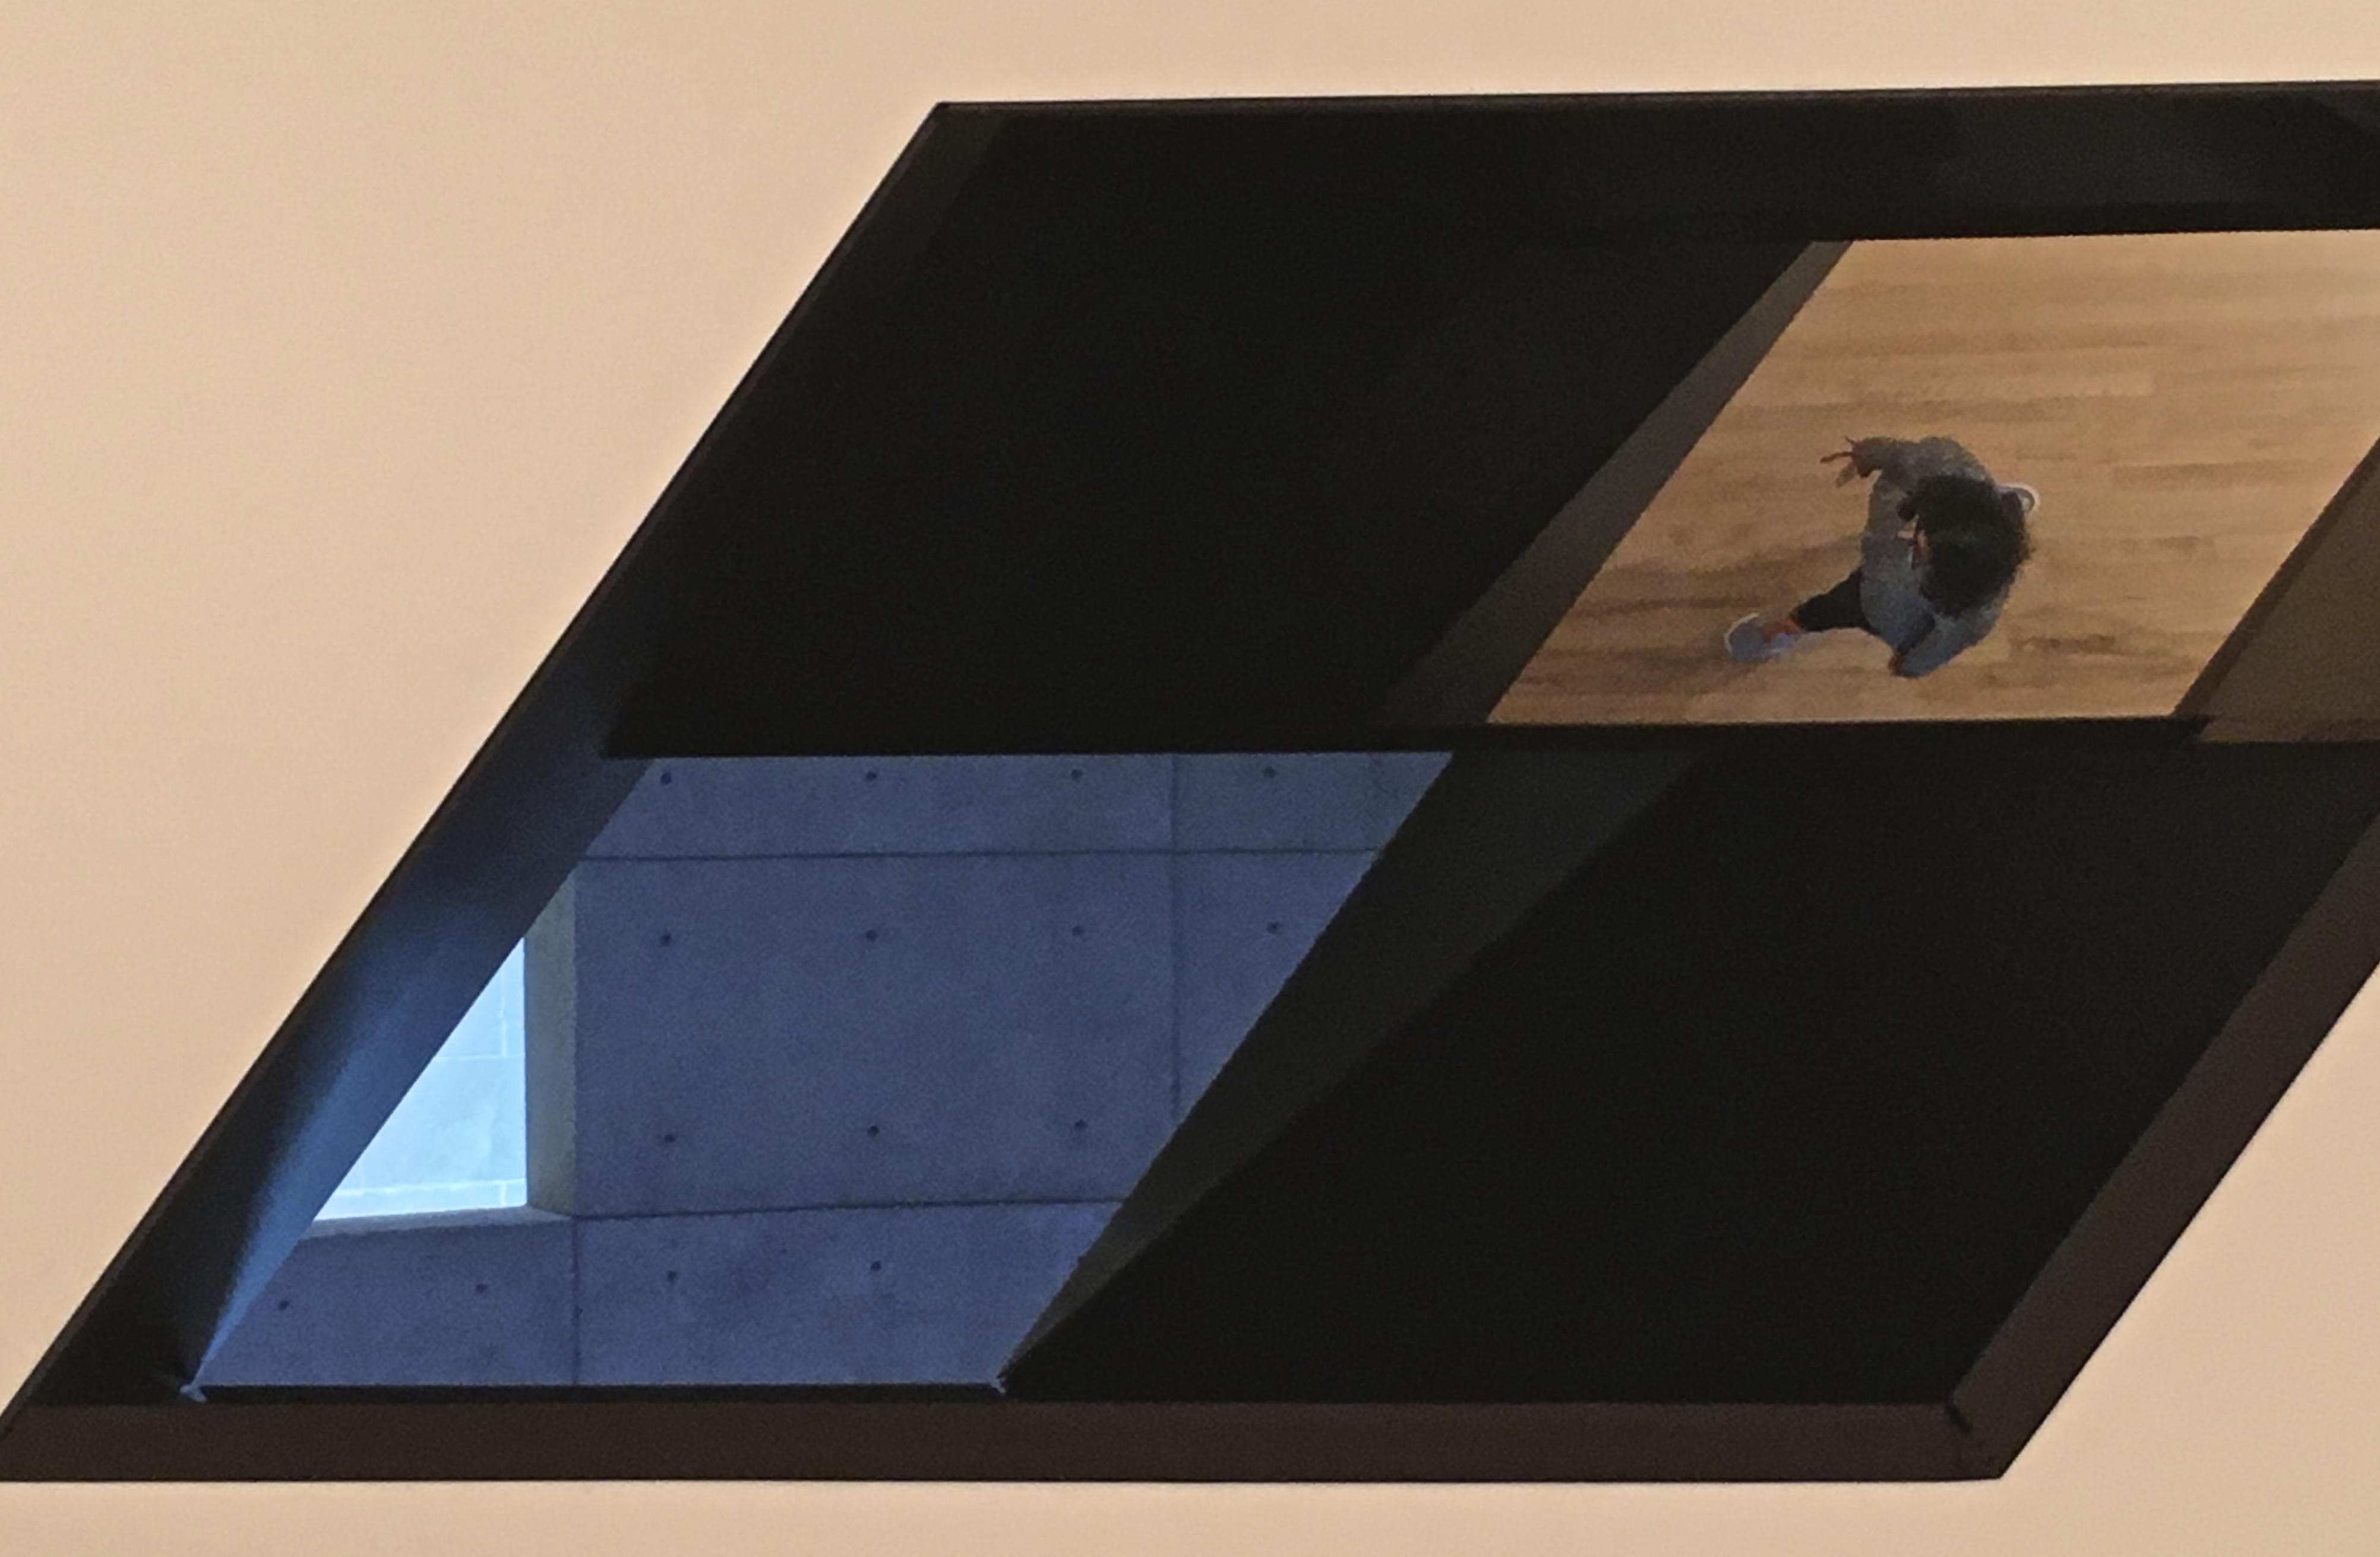 W 120301 By Sarah Oppenheimer 2012